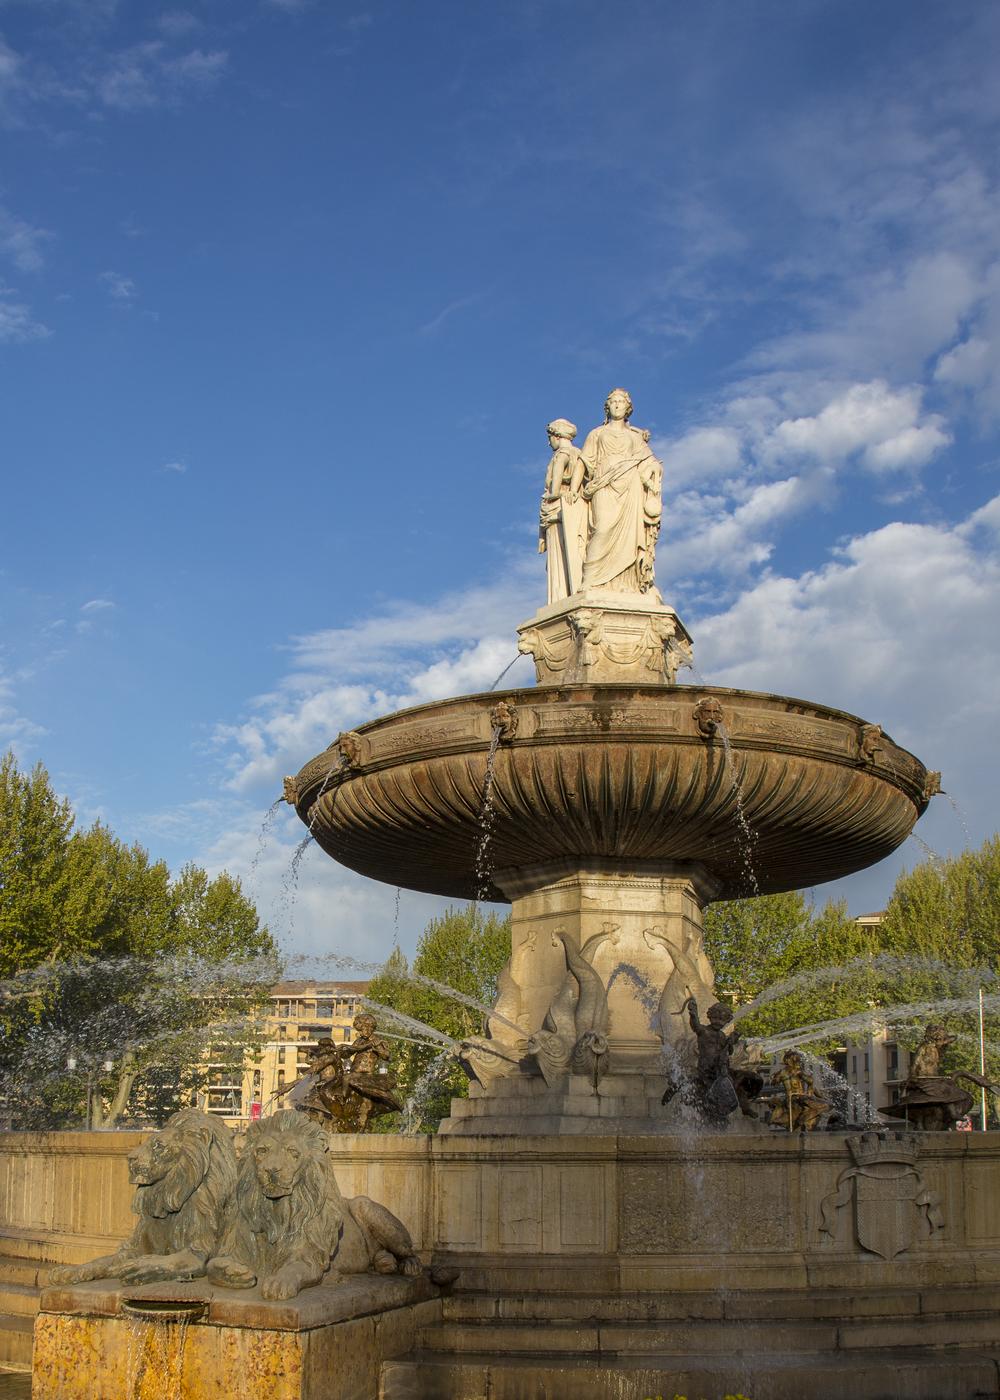 The main piece of the Fontaine de la Rotonde